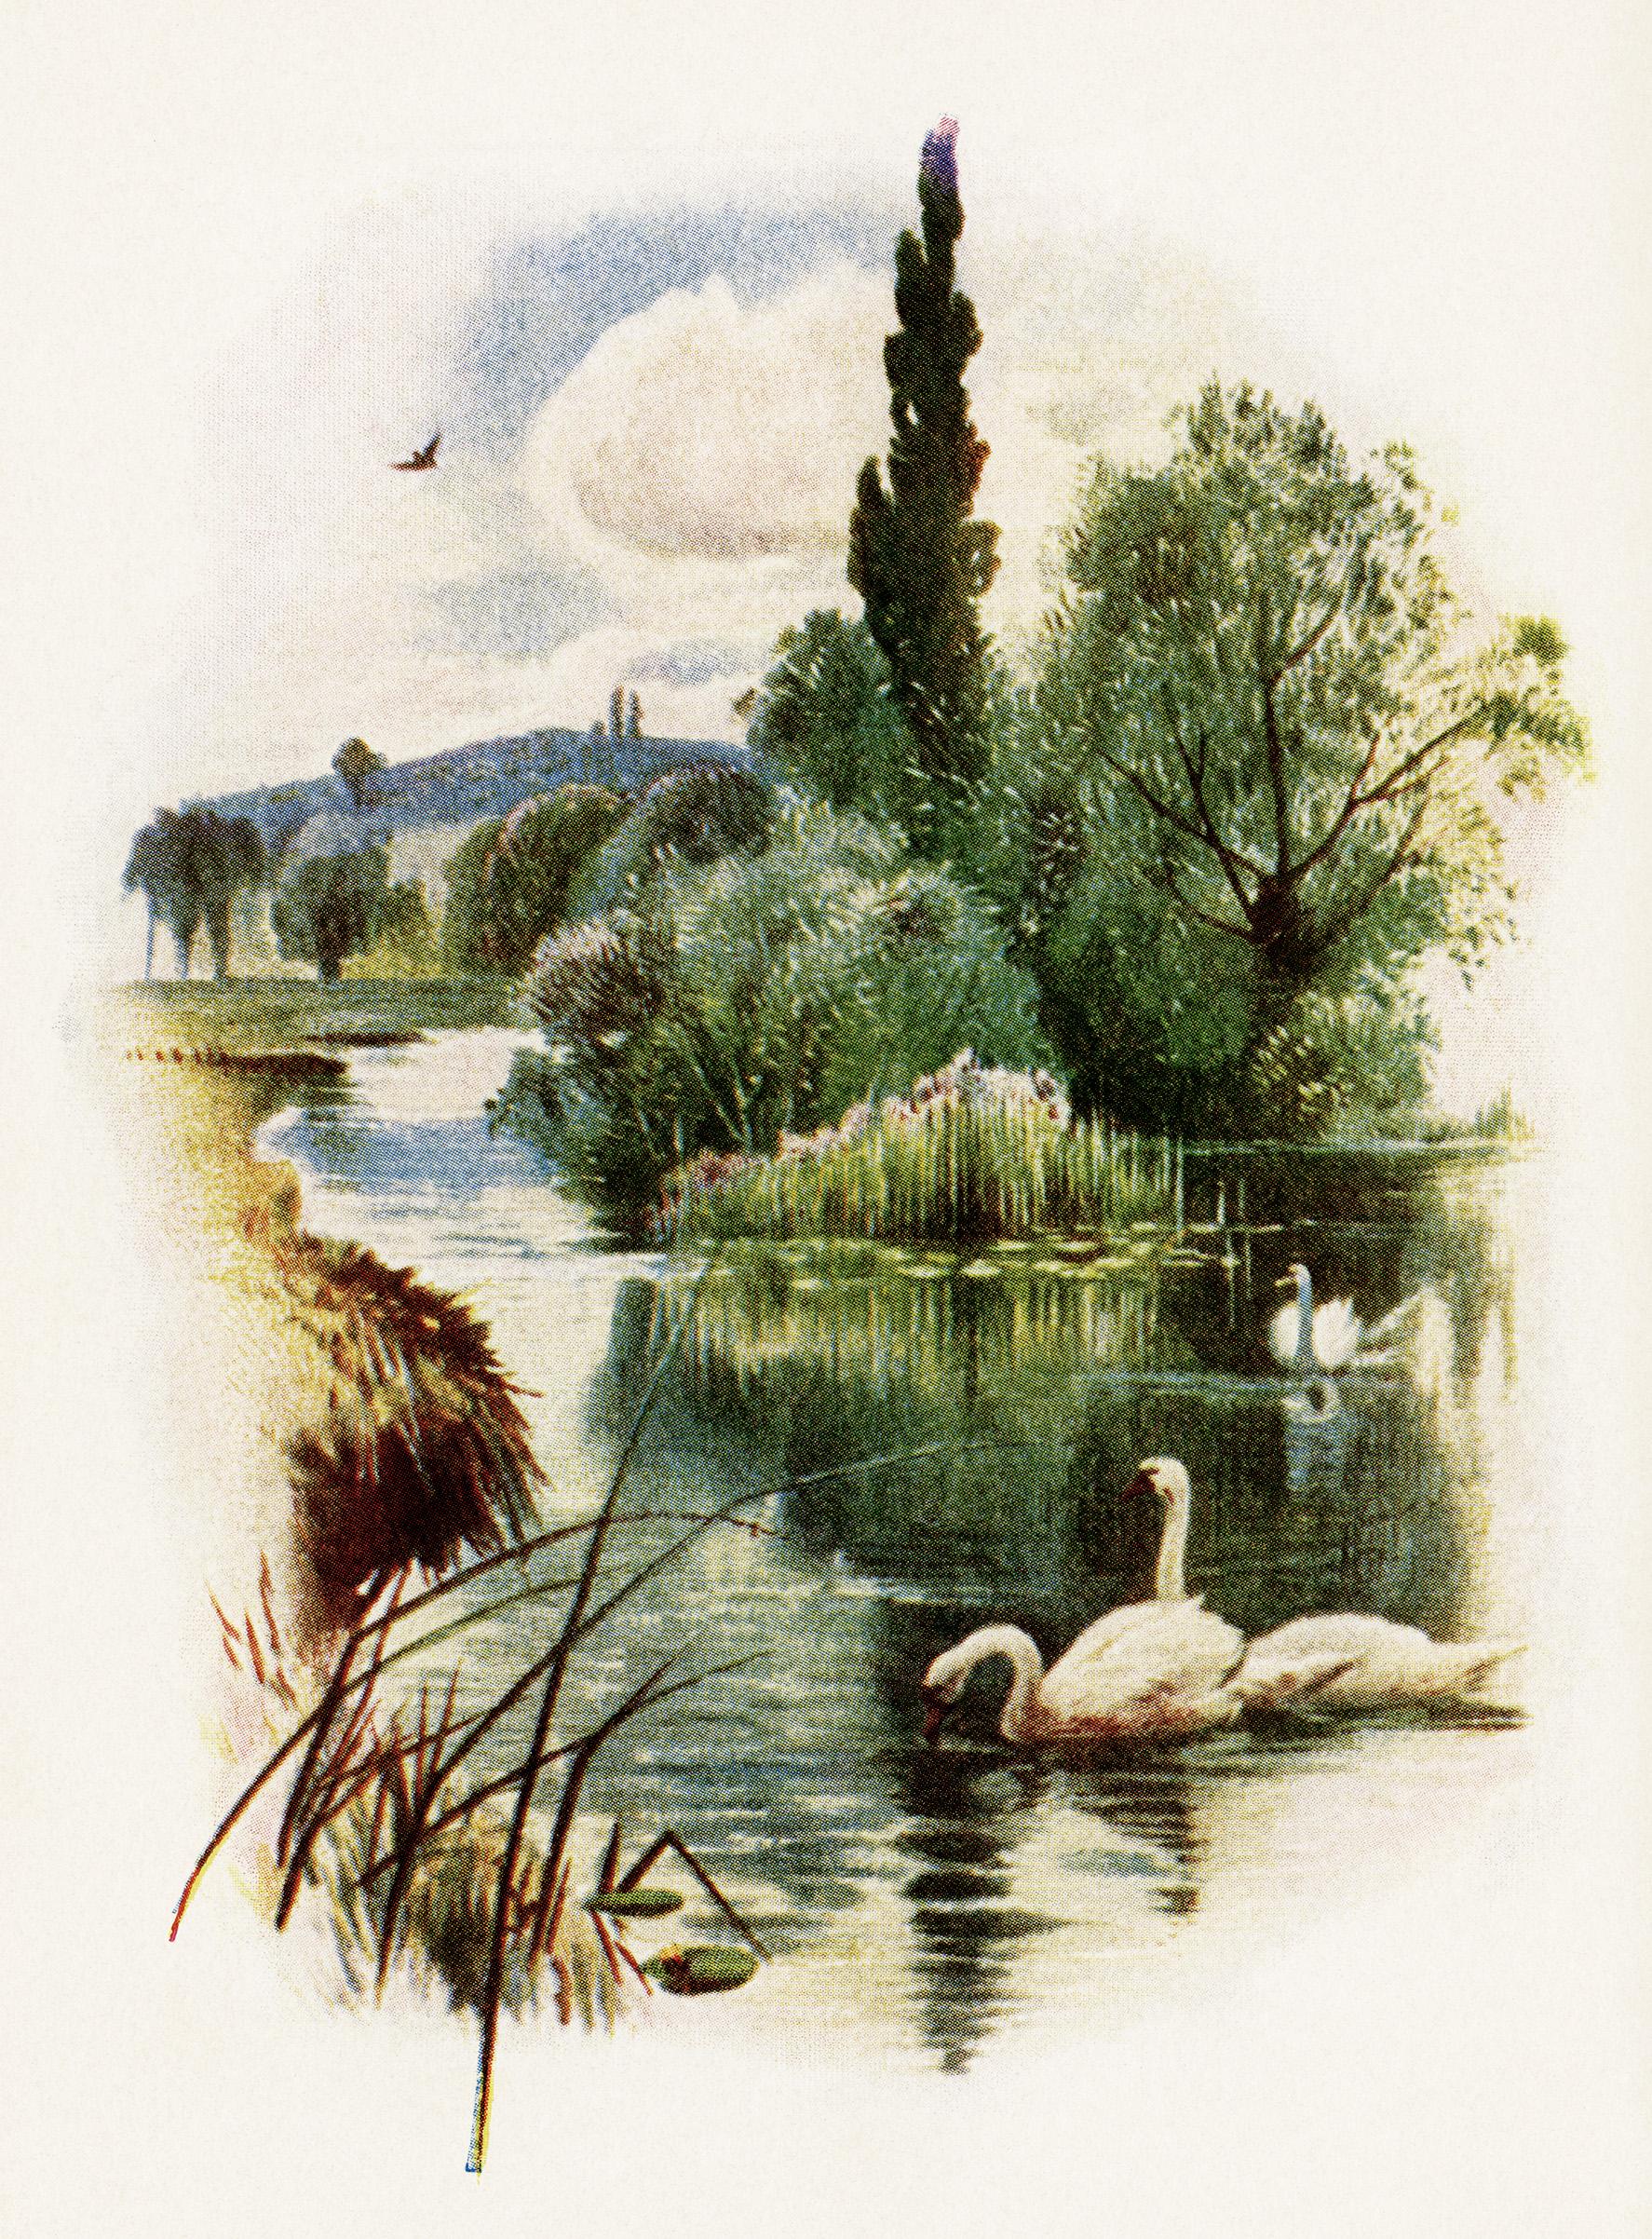 Countyside clipart outdoor scene Art art swan vintage outdoors